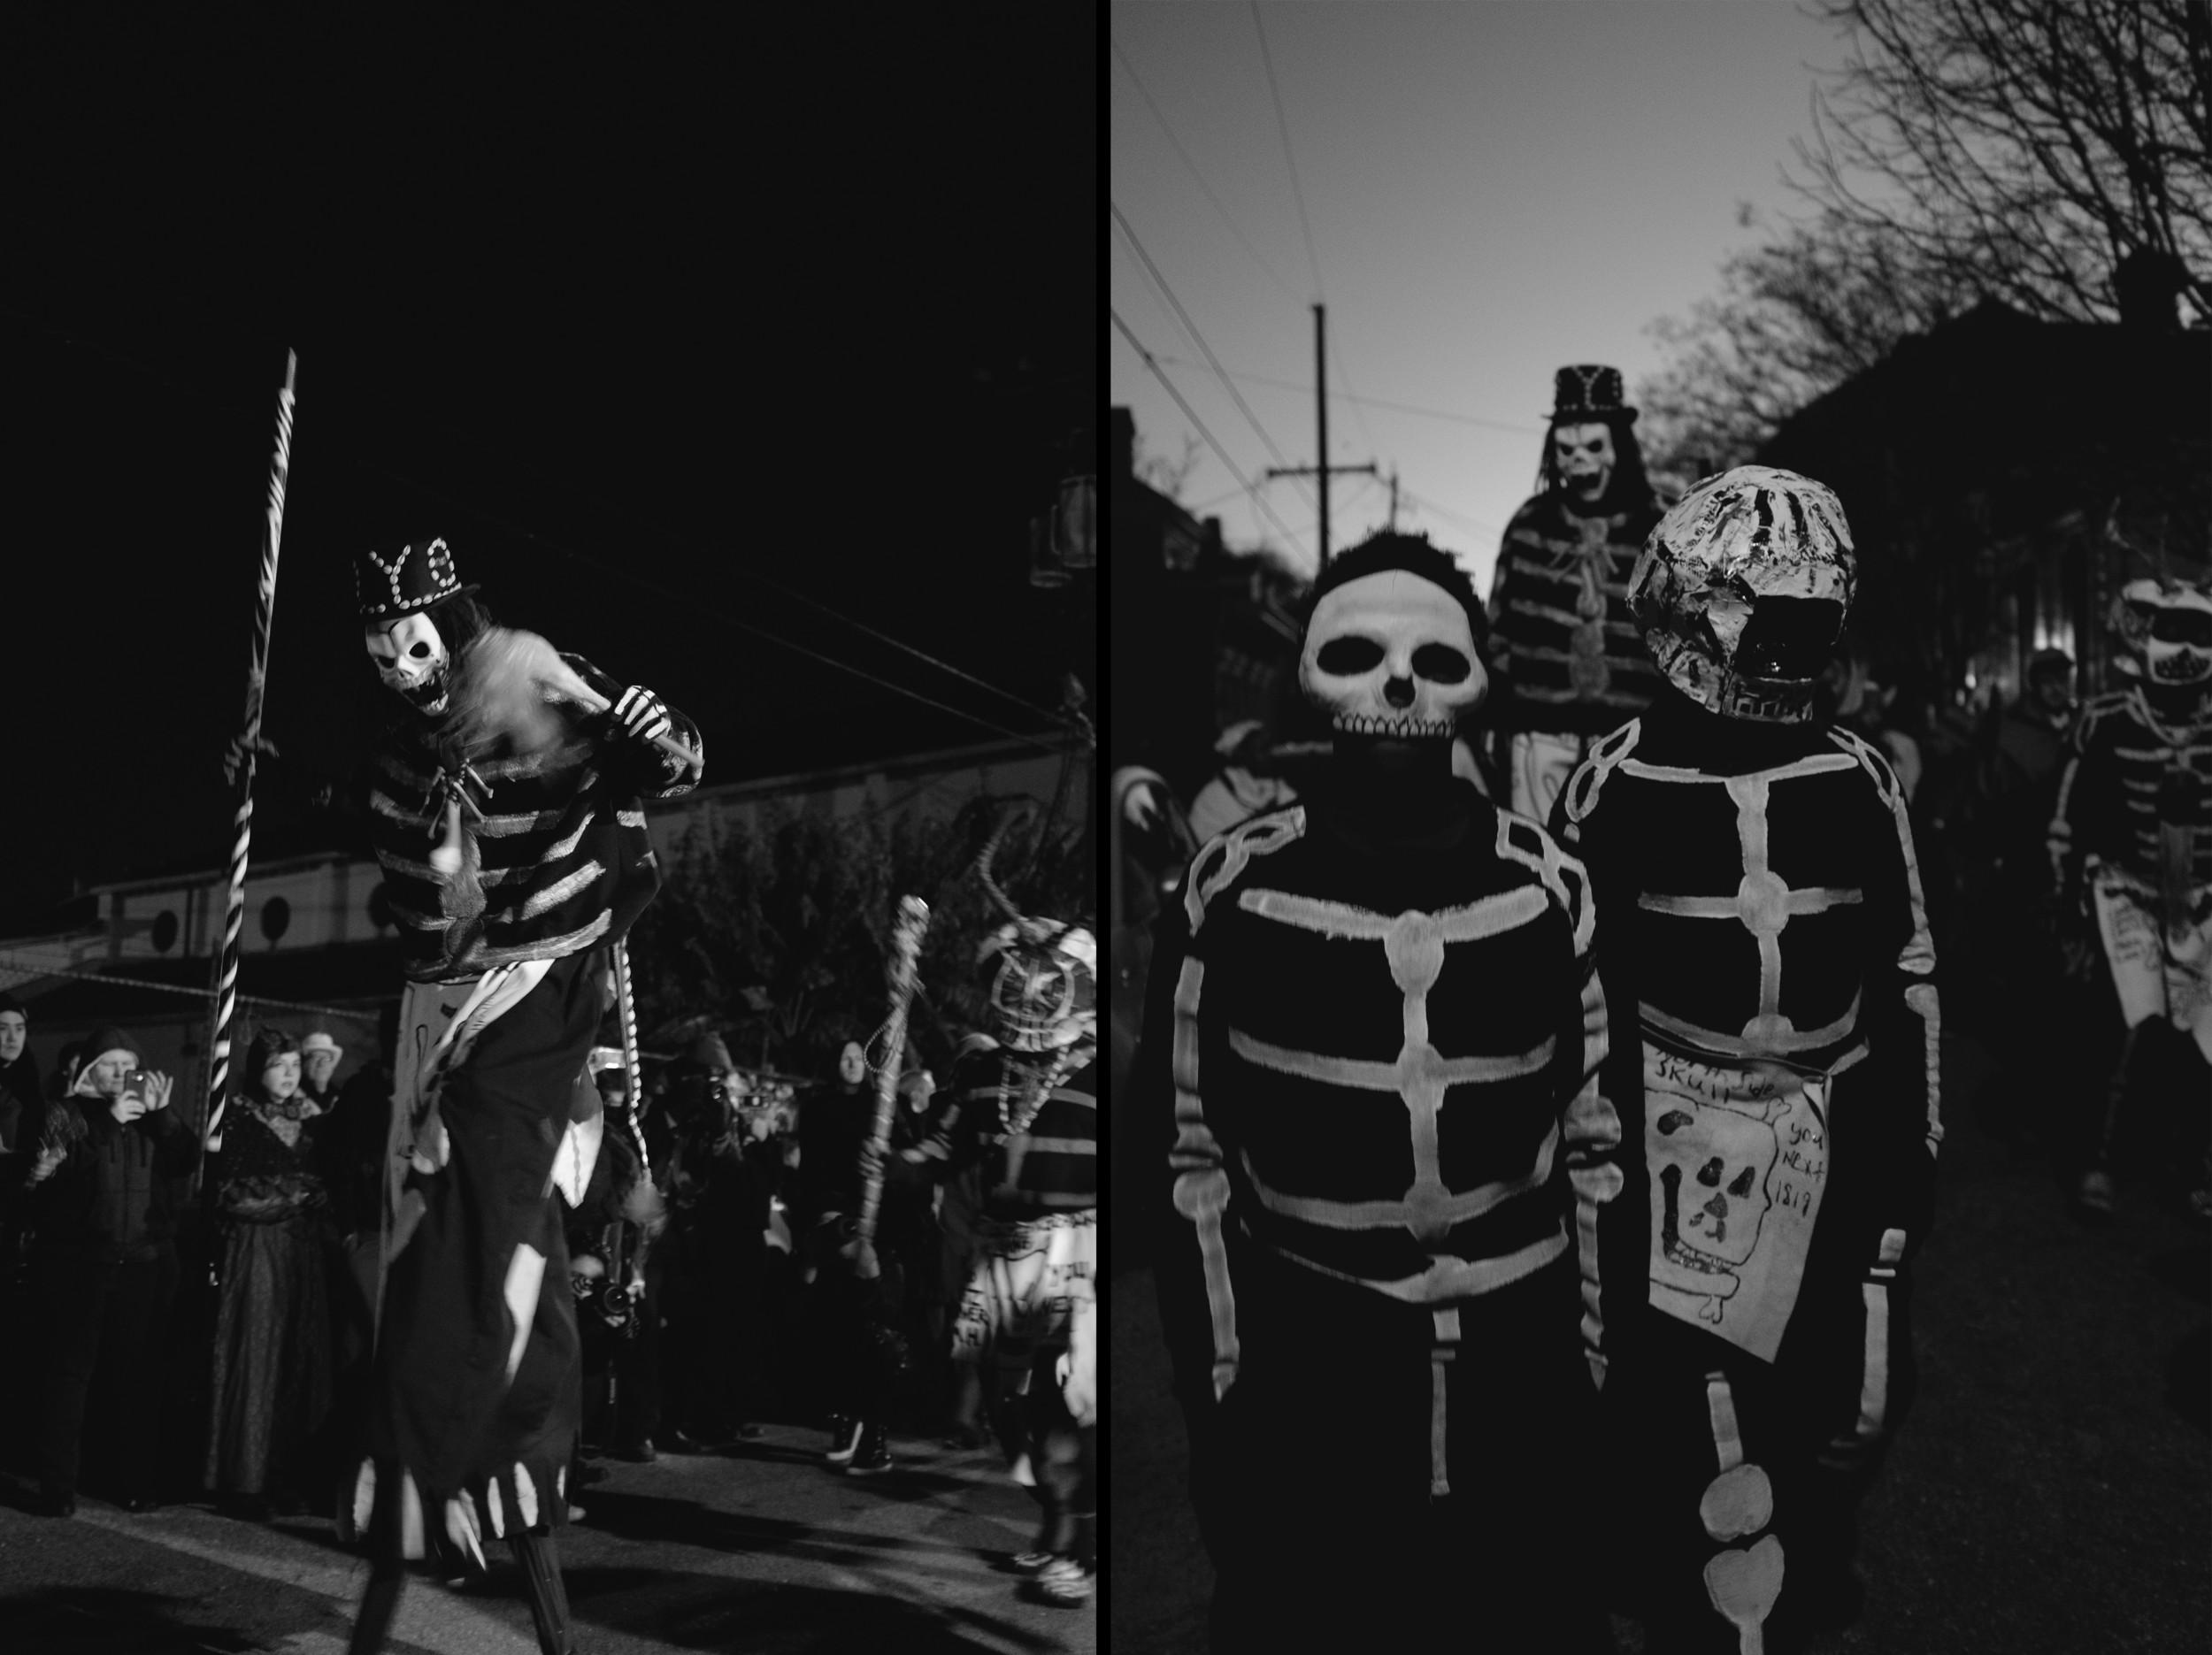 Skull and Bone Gang_Josefina Santos Photo_6.jpg